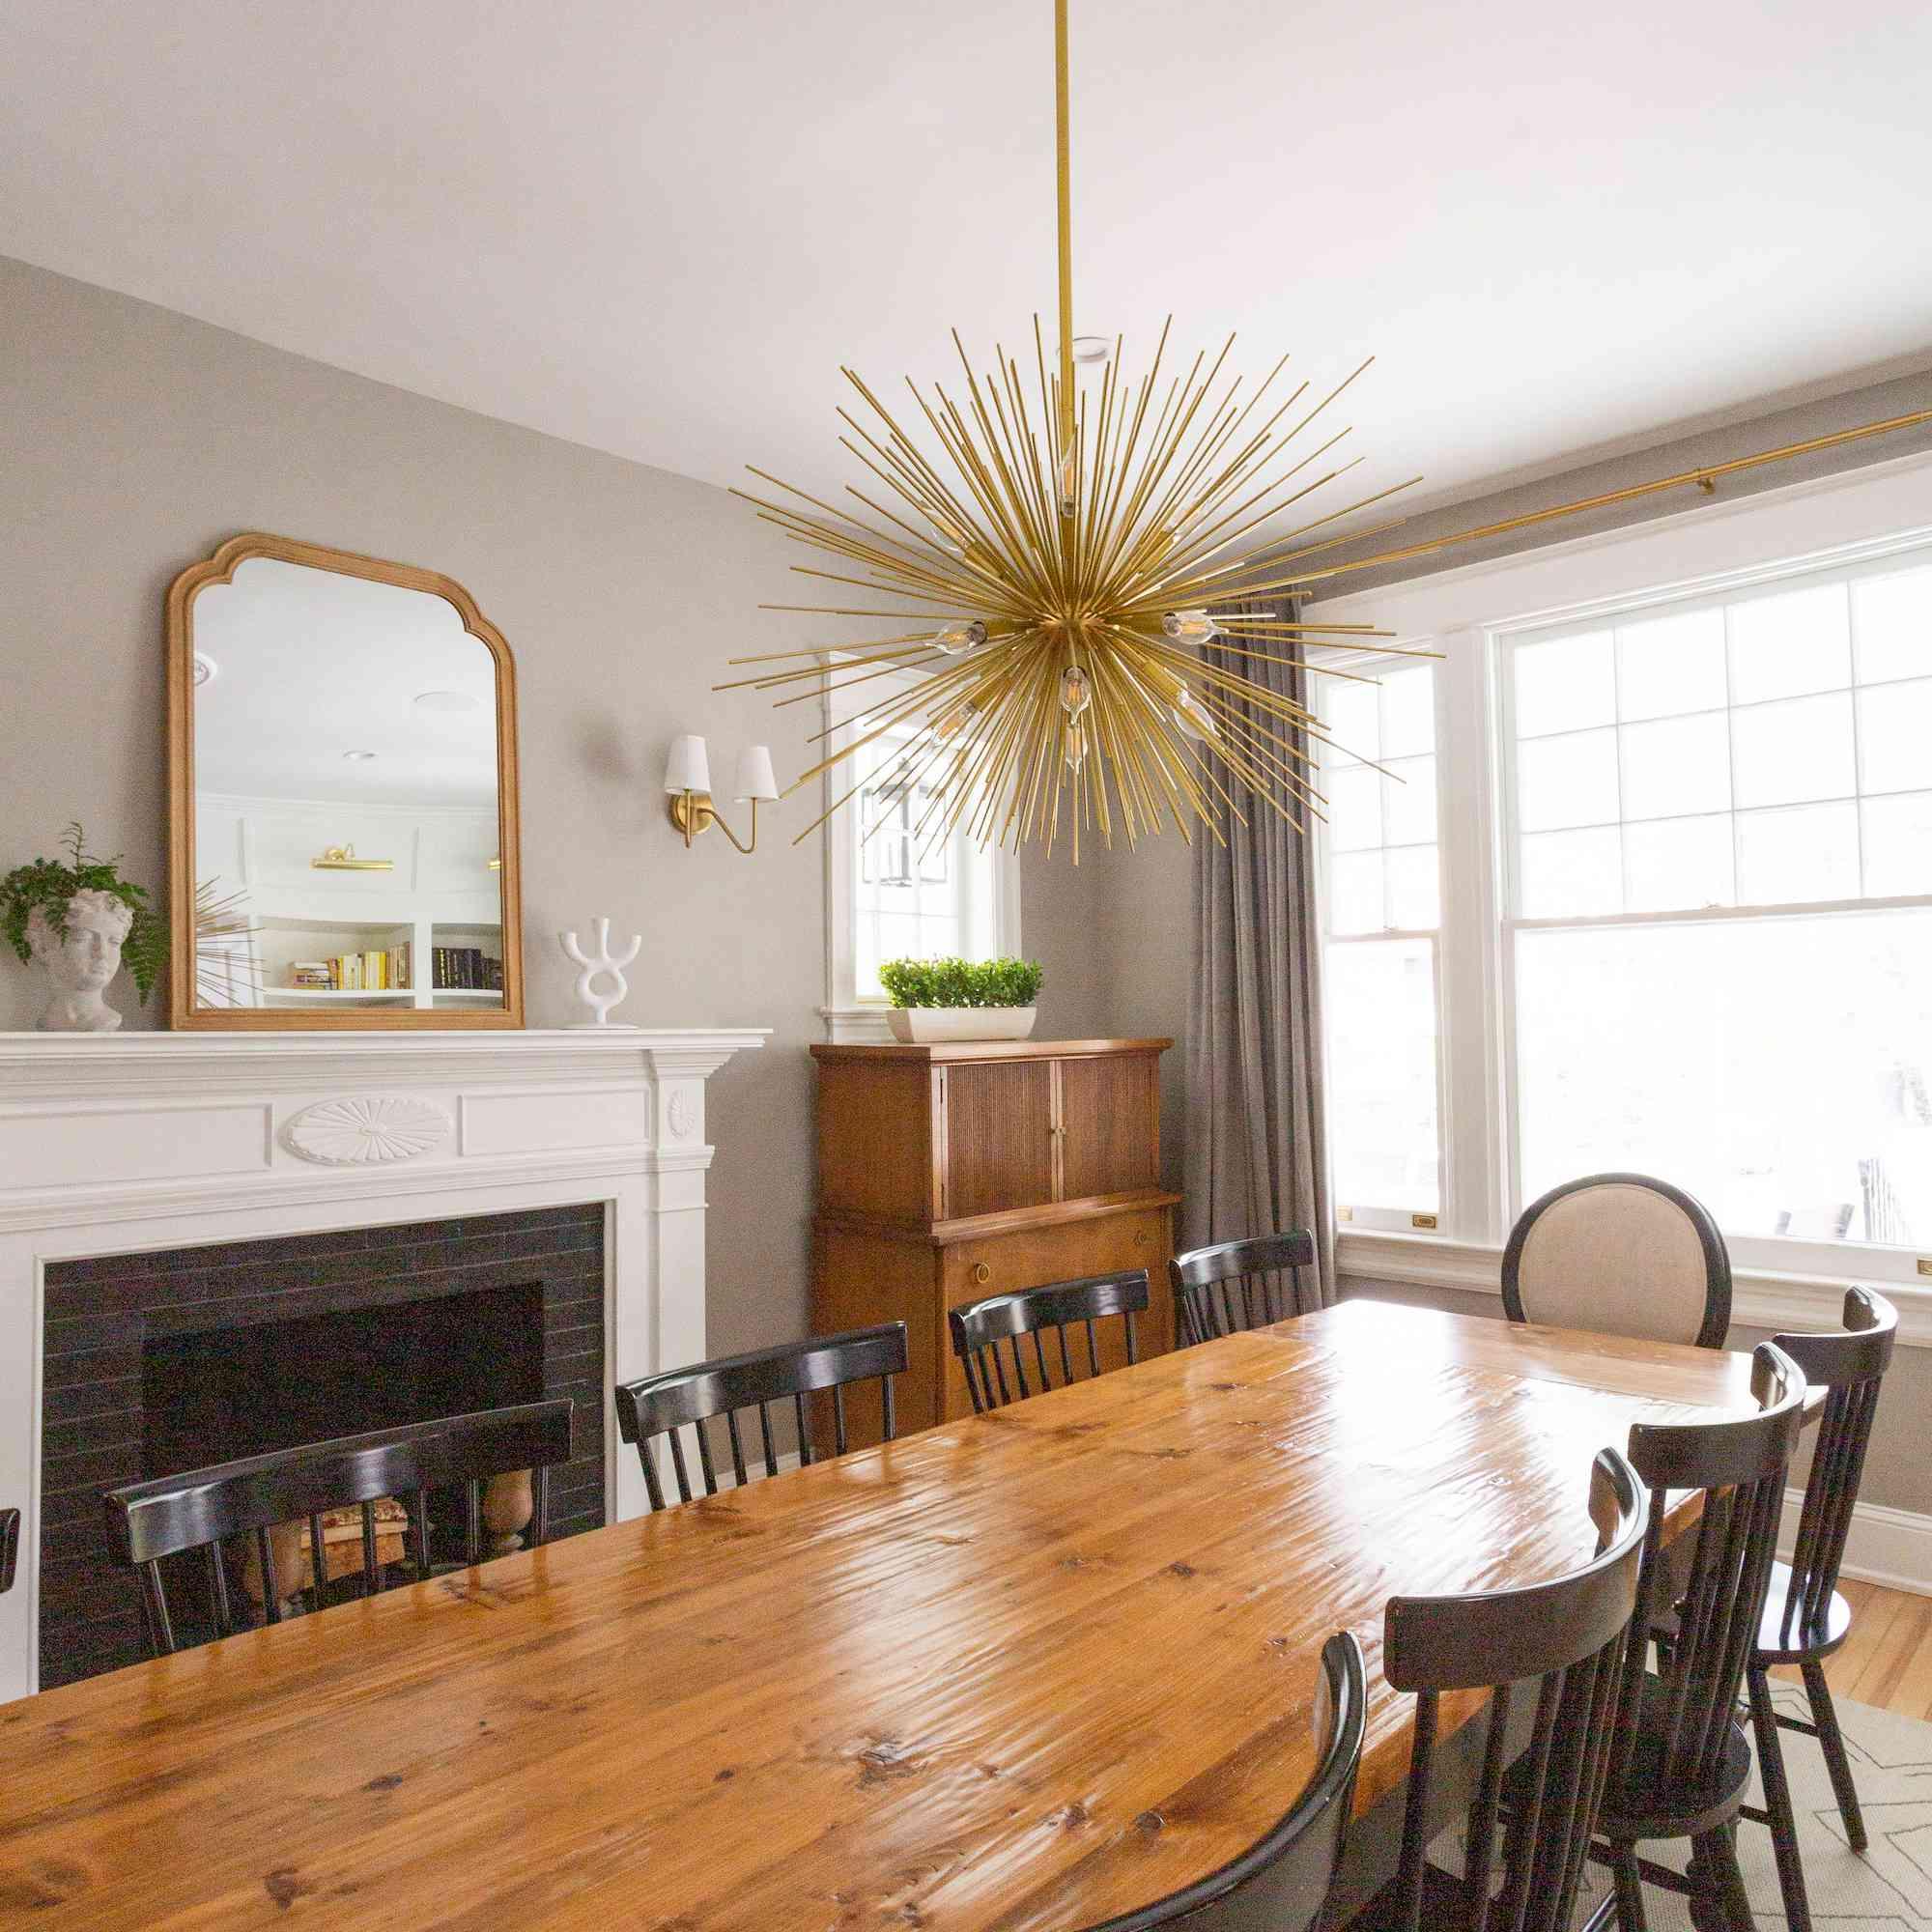 Dining room with starburst pendant light fixture.